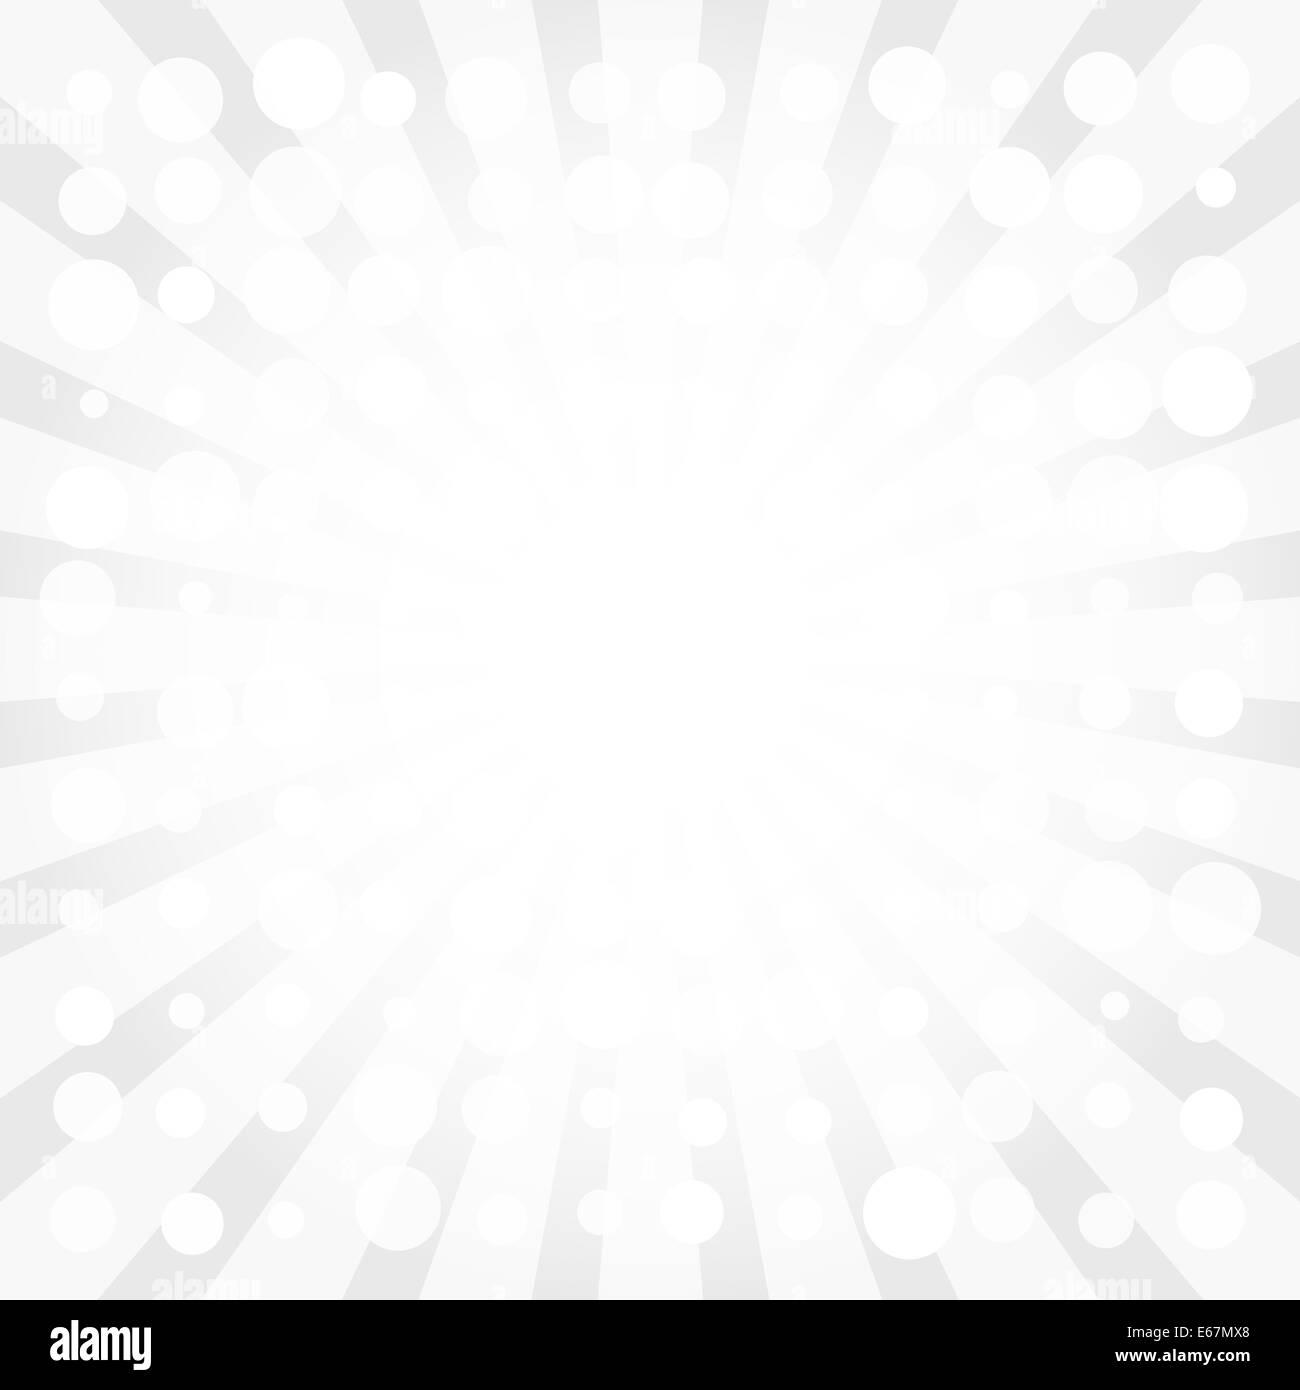 Graustufen Strahlen Textur Hintergrund illustration Stockbild